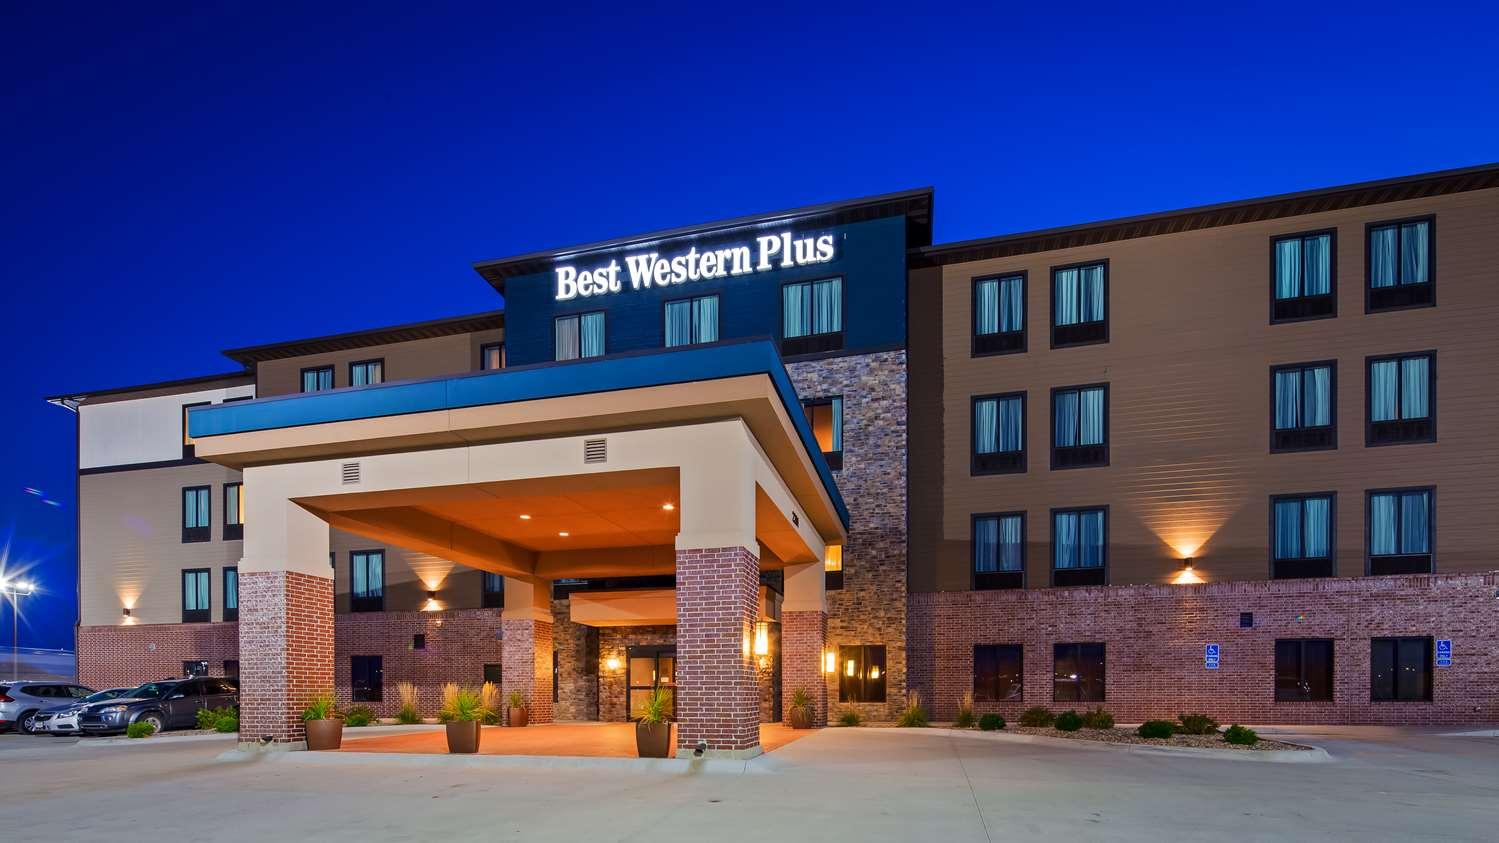 hotels chicago schiller image hare en hotel o near motel il zoo exterior park getbrandname lincoln motels in